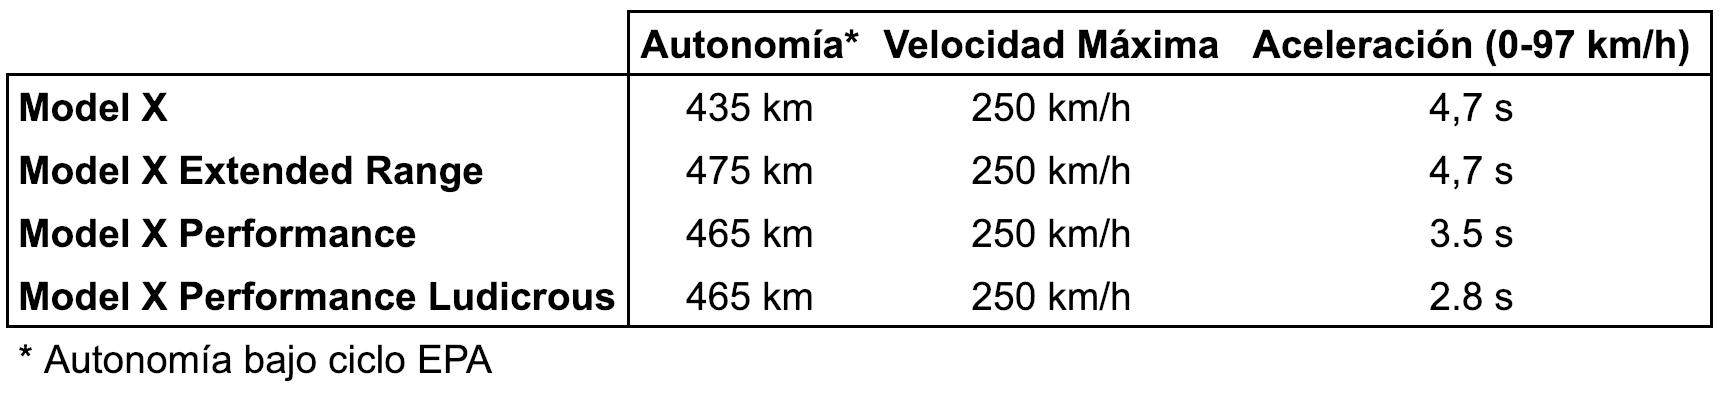 Tesla Model X datos técnicos en km